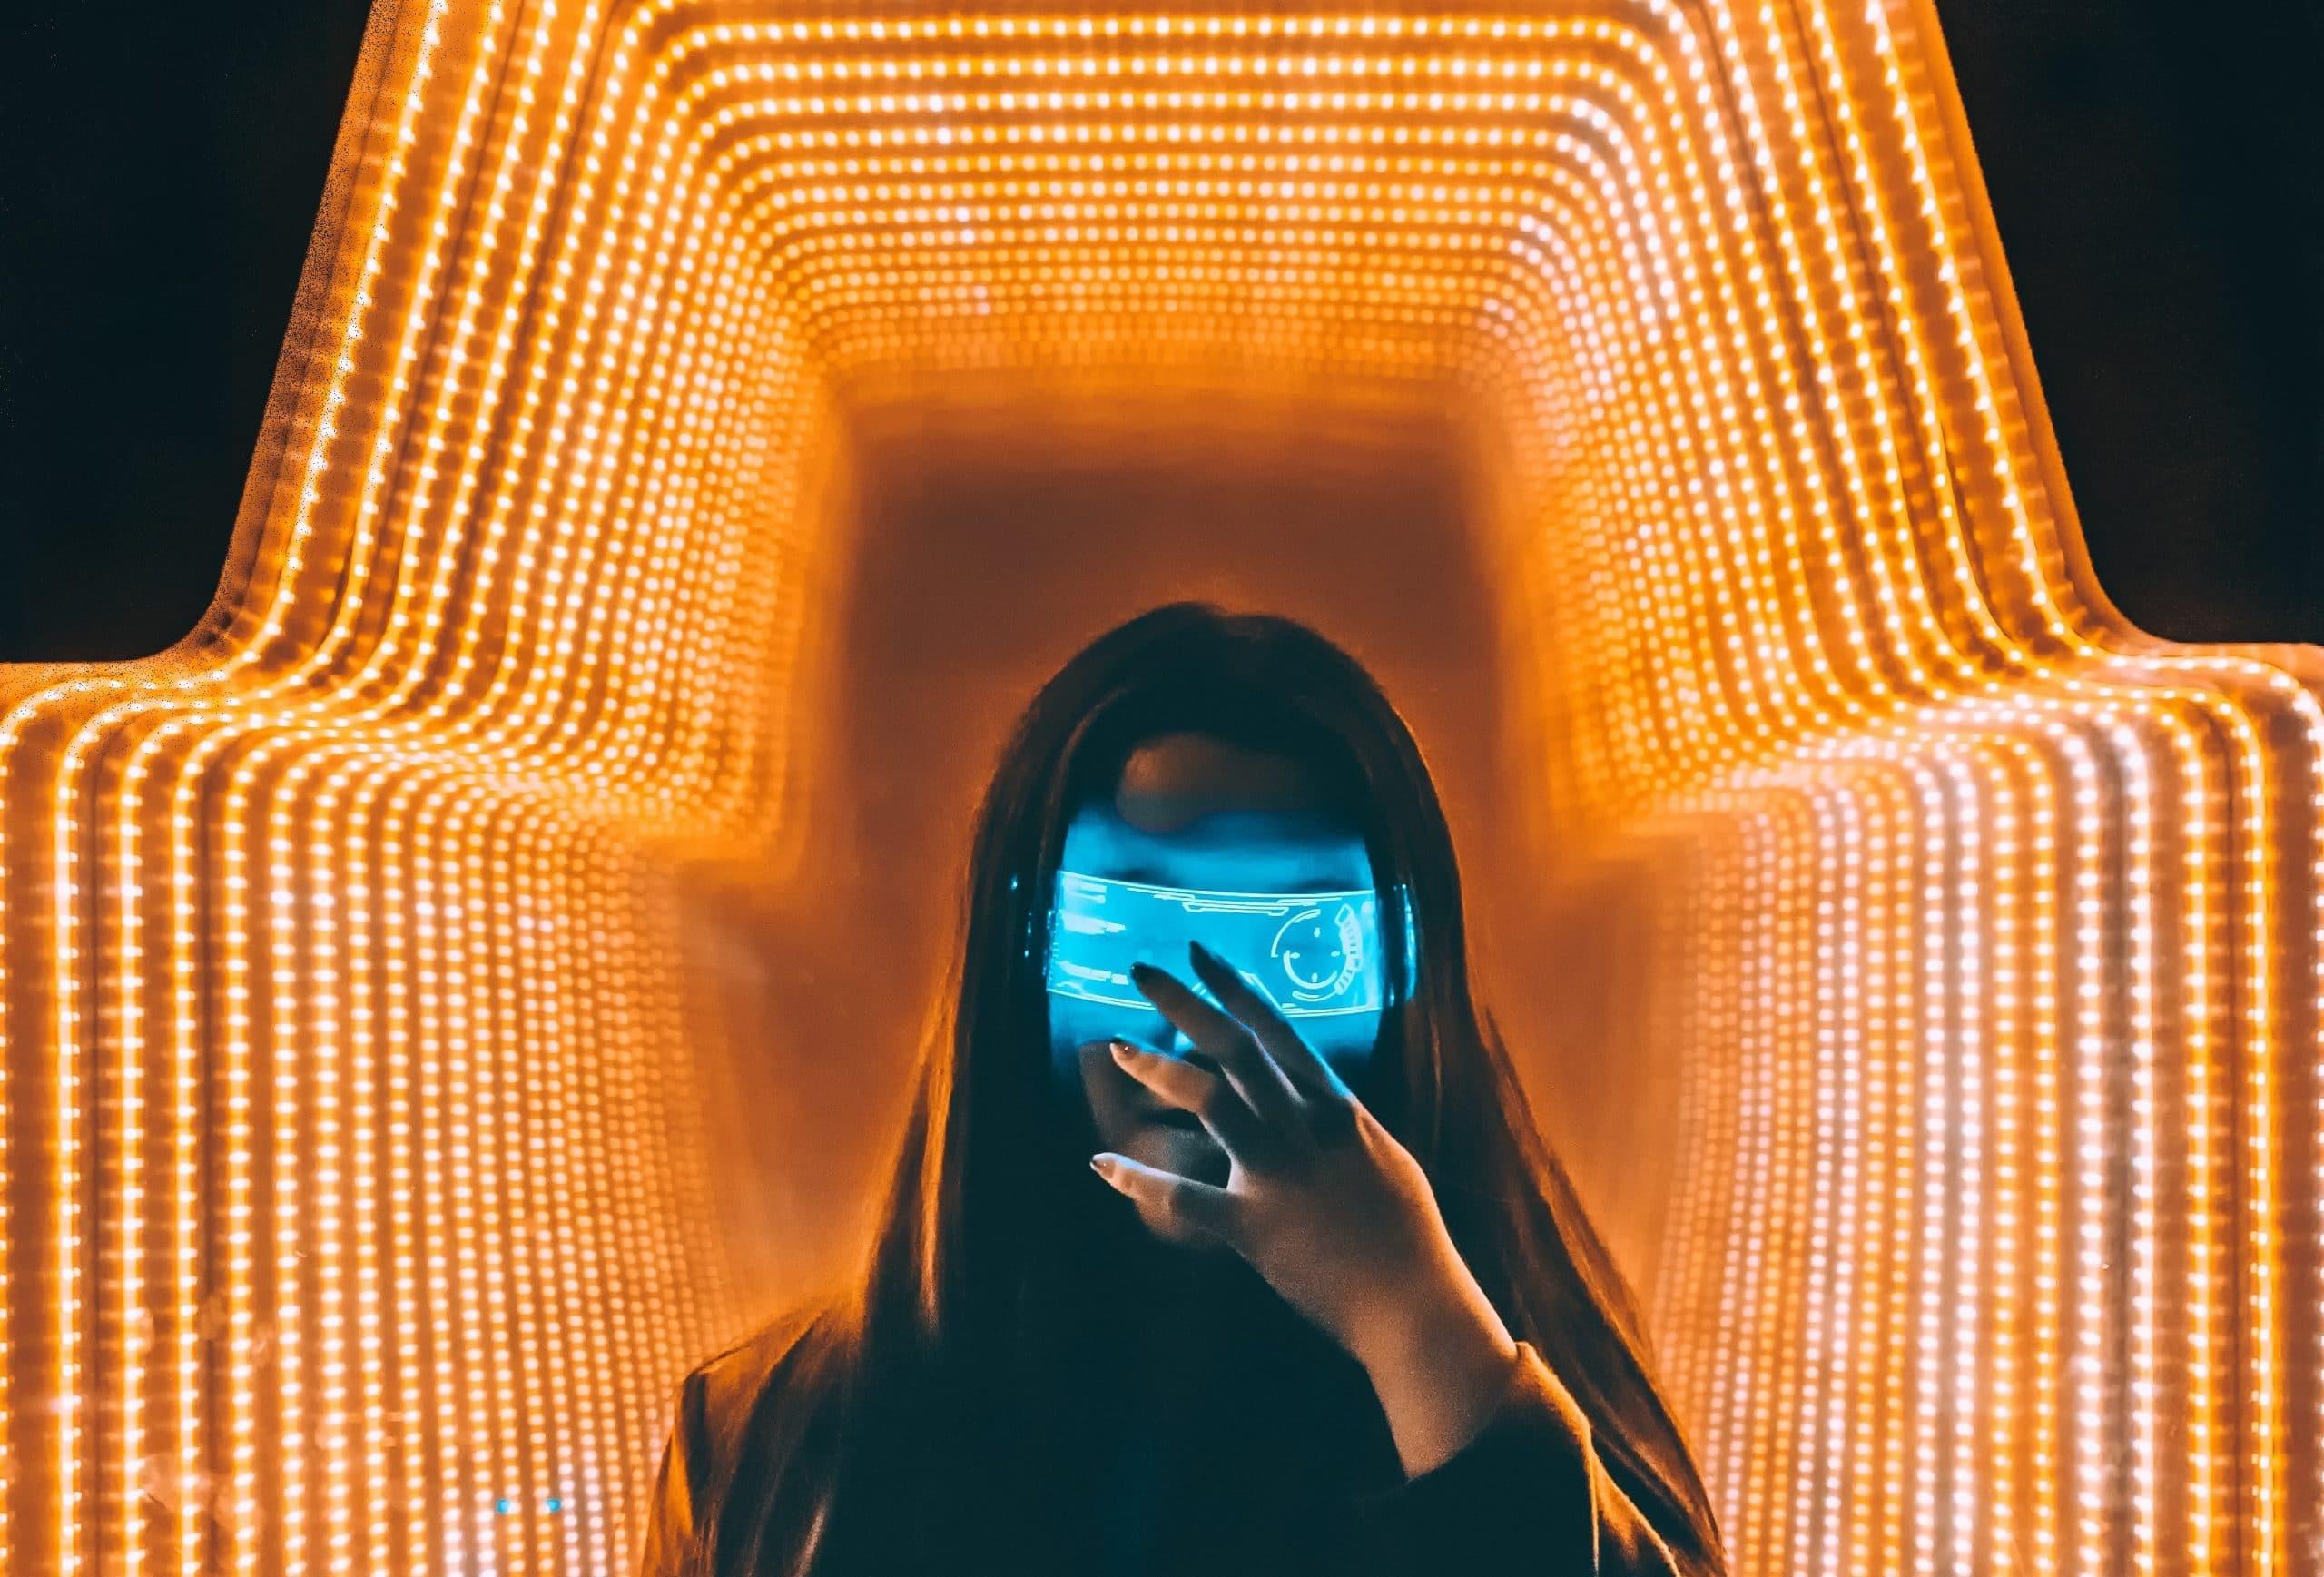 Cybermobbing